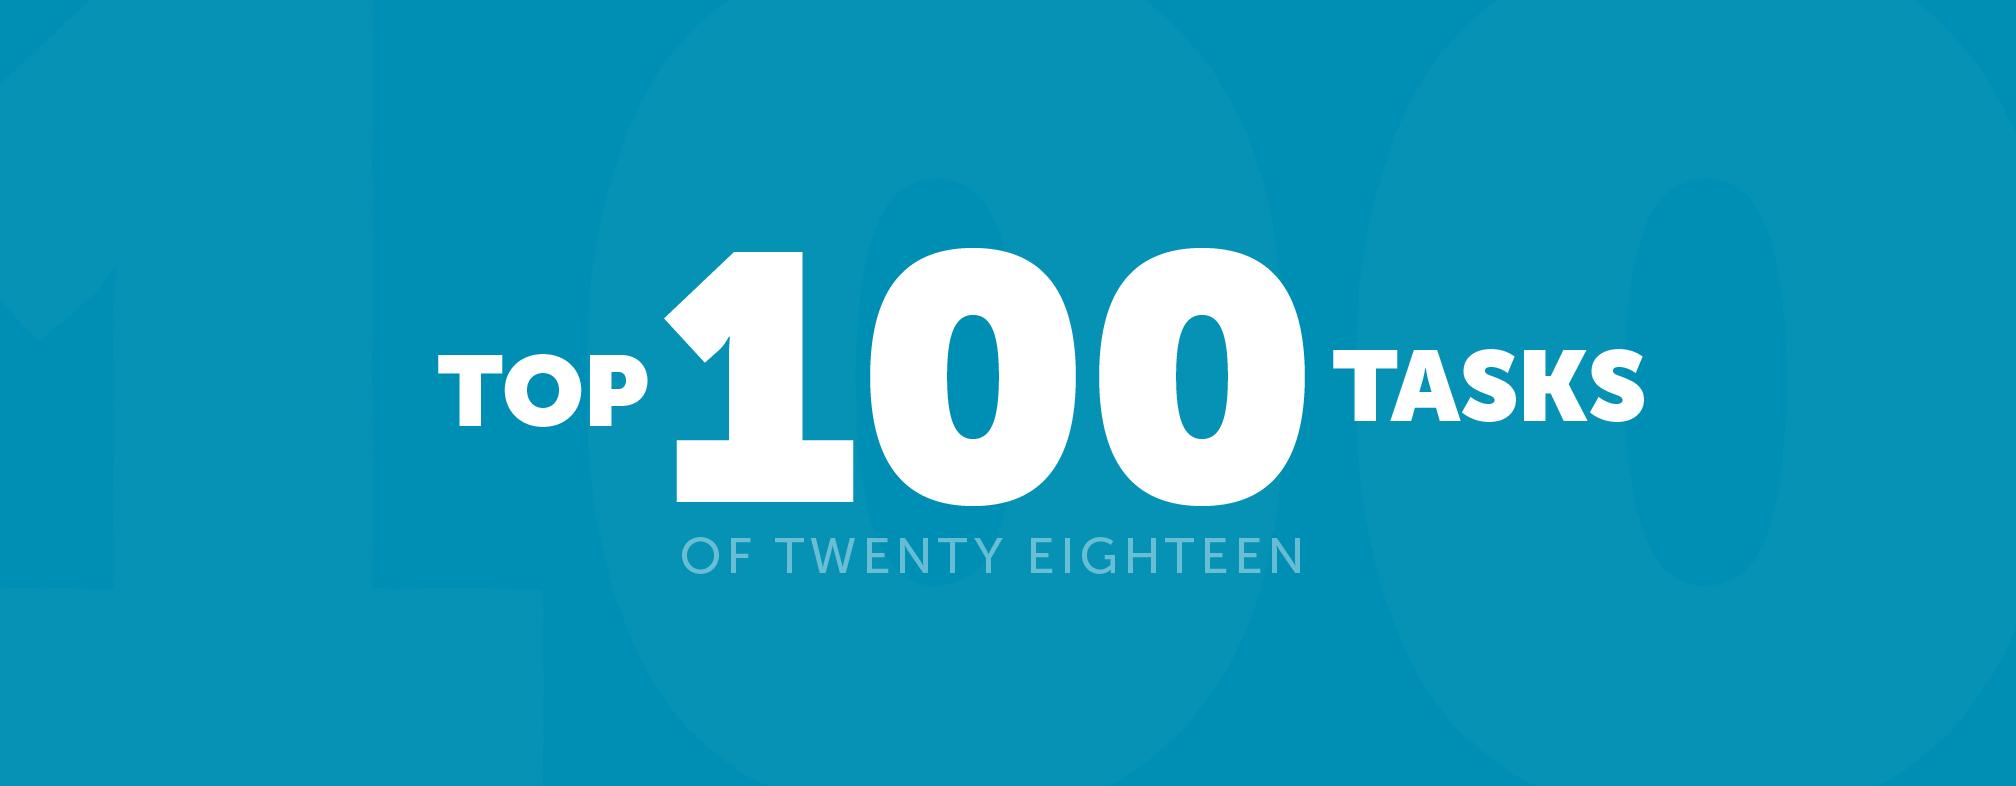 The best 100 tasks on Airtasker this year - Airtasker Blog